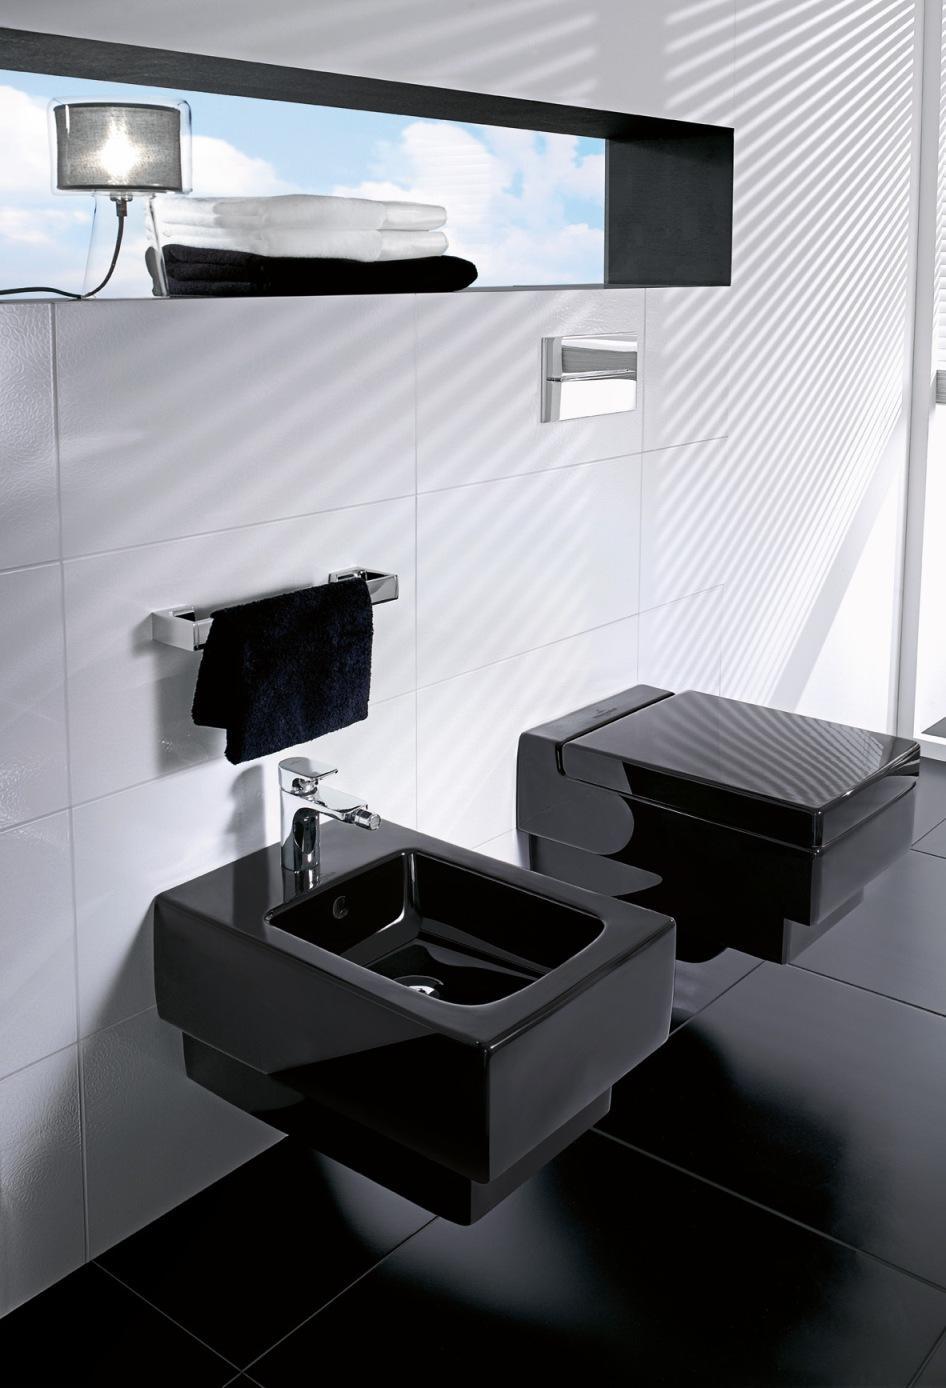 Minimalizm w łazience: nowe kolory mebli Memento Villeroy & Boch